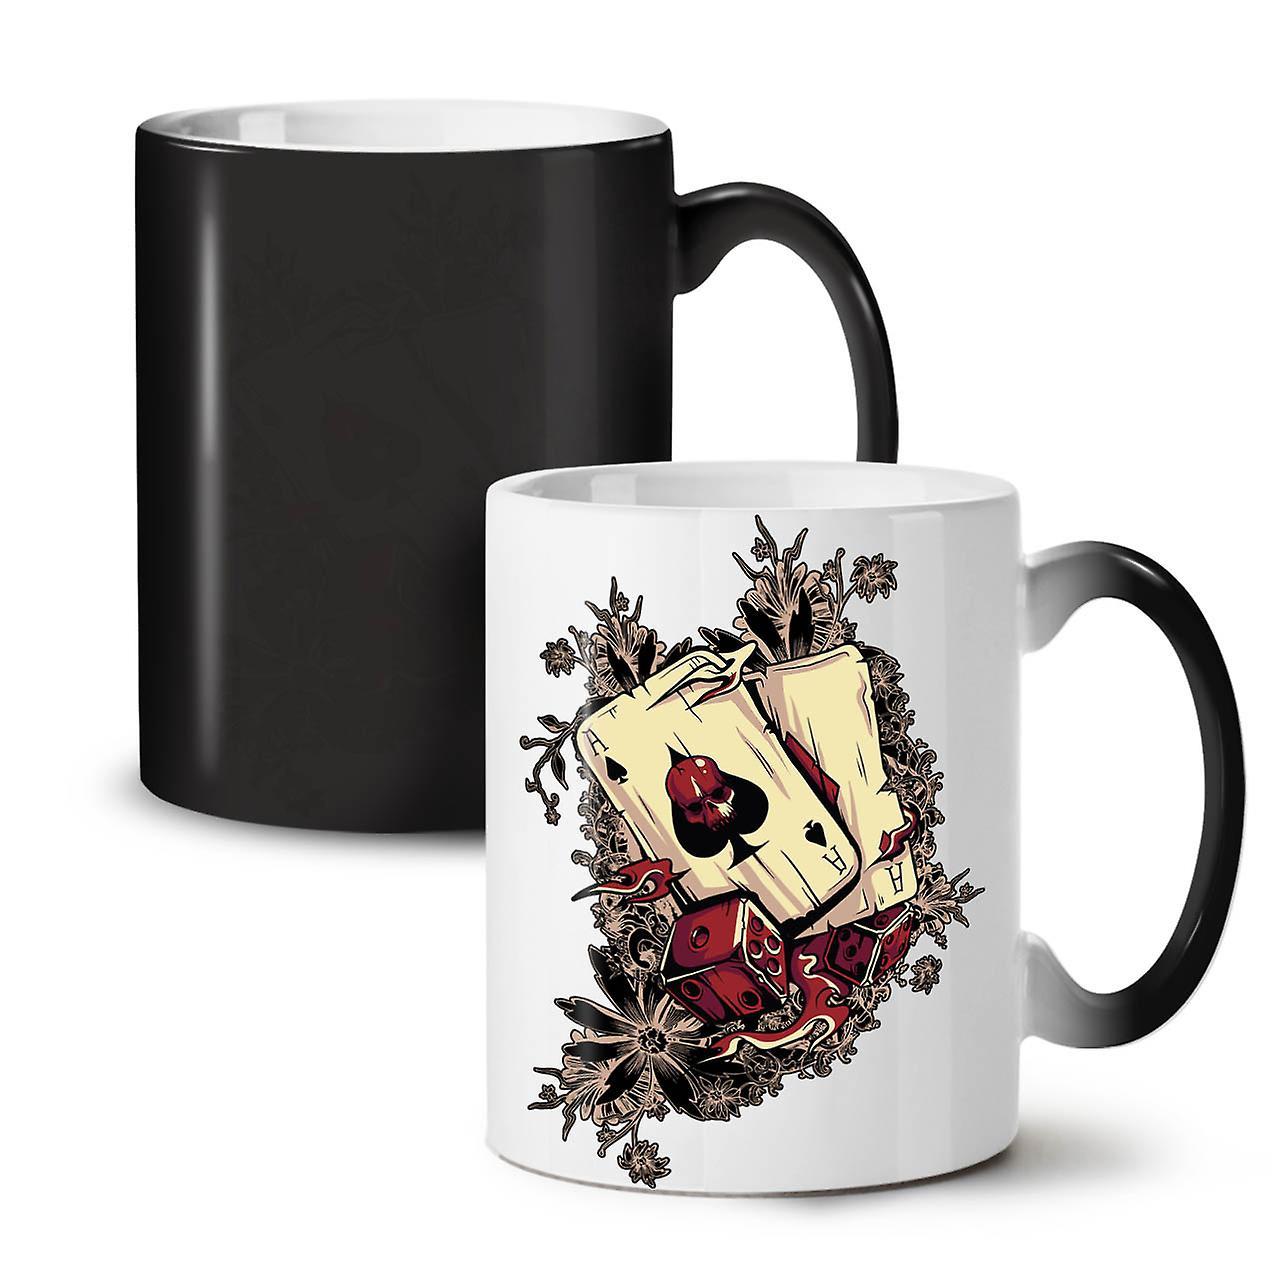 New OzWellcoda Colour 11 Gamble Changing Poker Coffee Player Tea Mug Ceramic Black rQBedCWEox